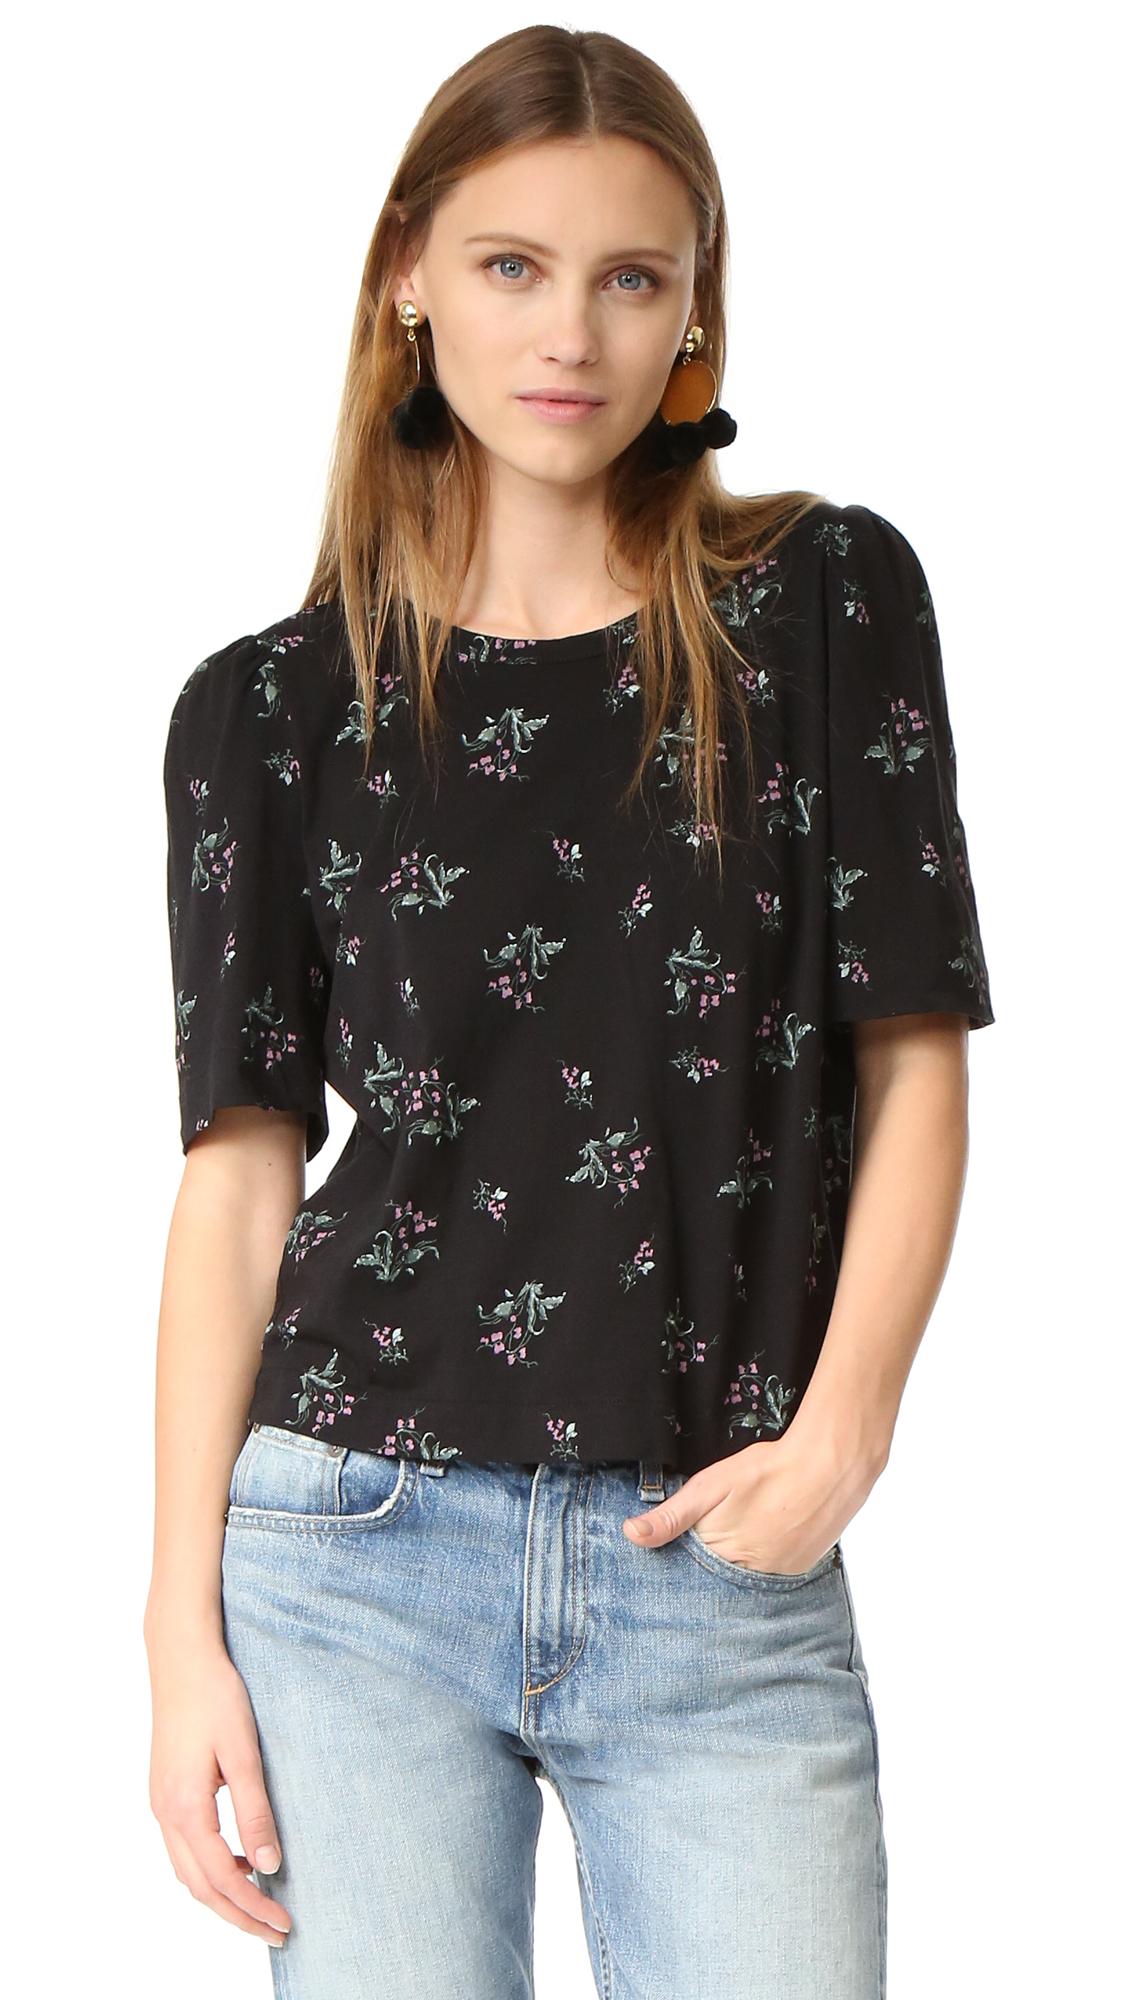 La Vie Rebecca Taylor Short Sleeve Antique Floral Tee - Washed Black at Shopbop